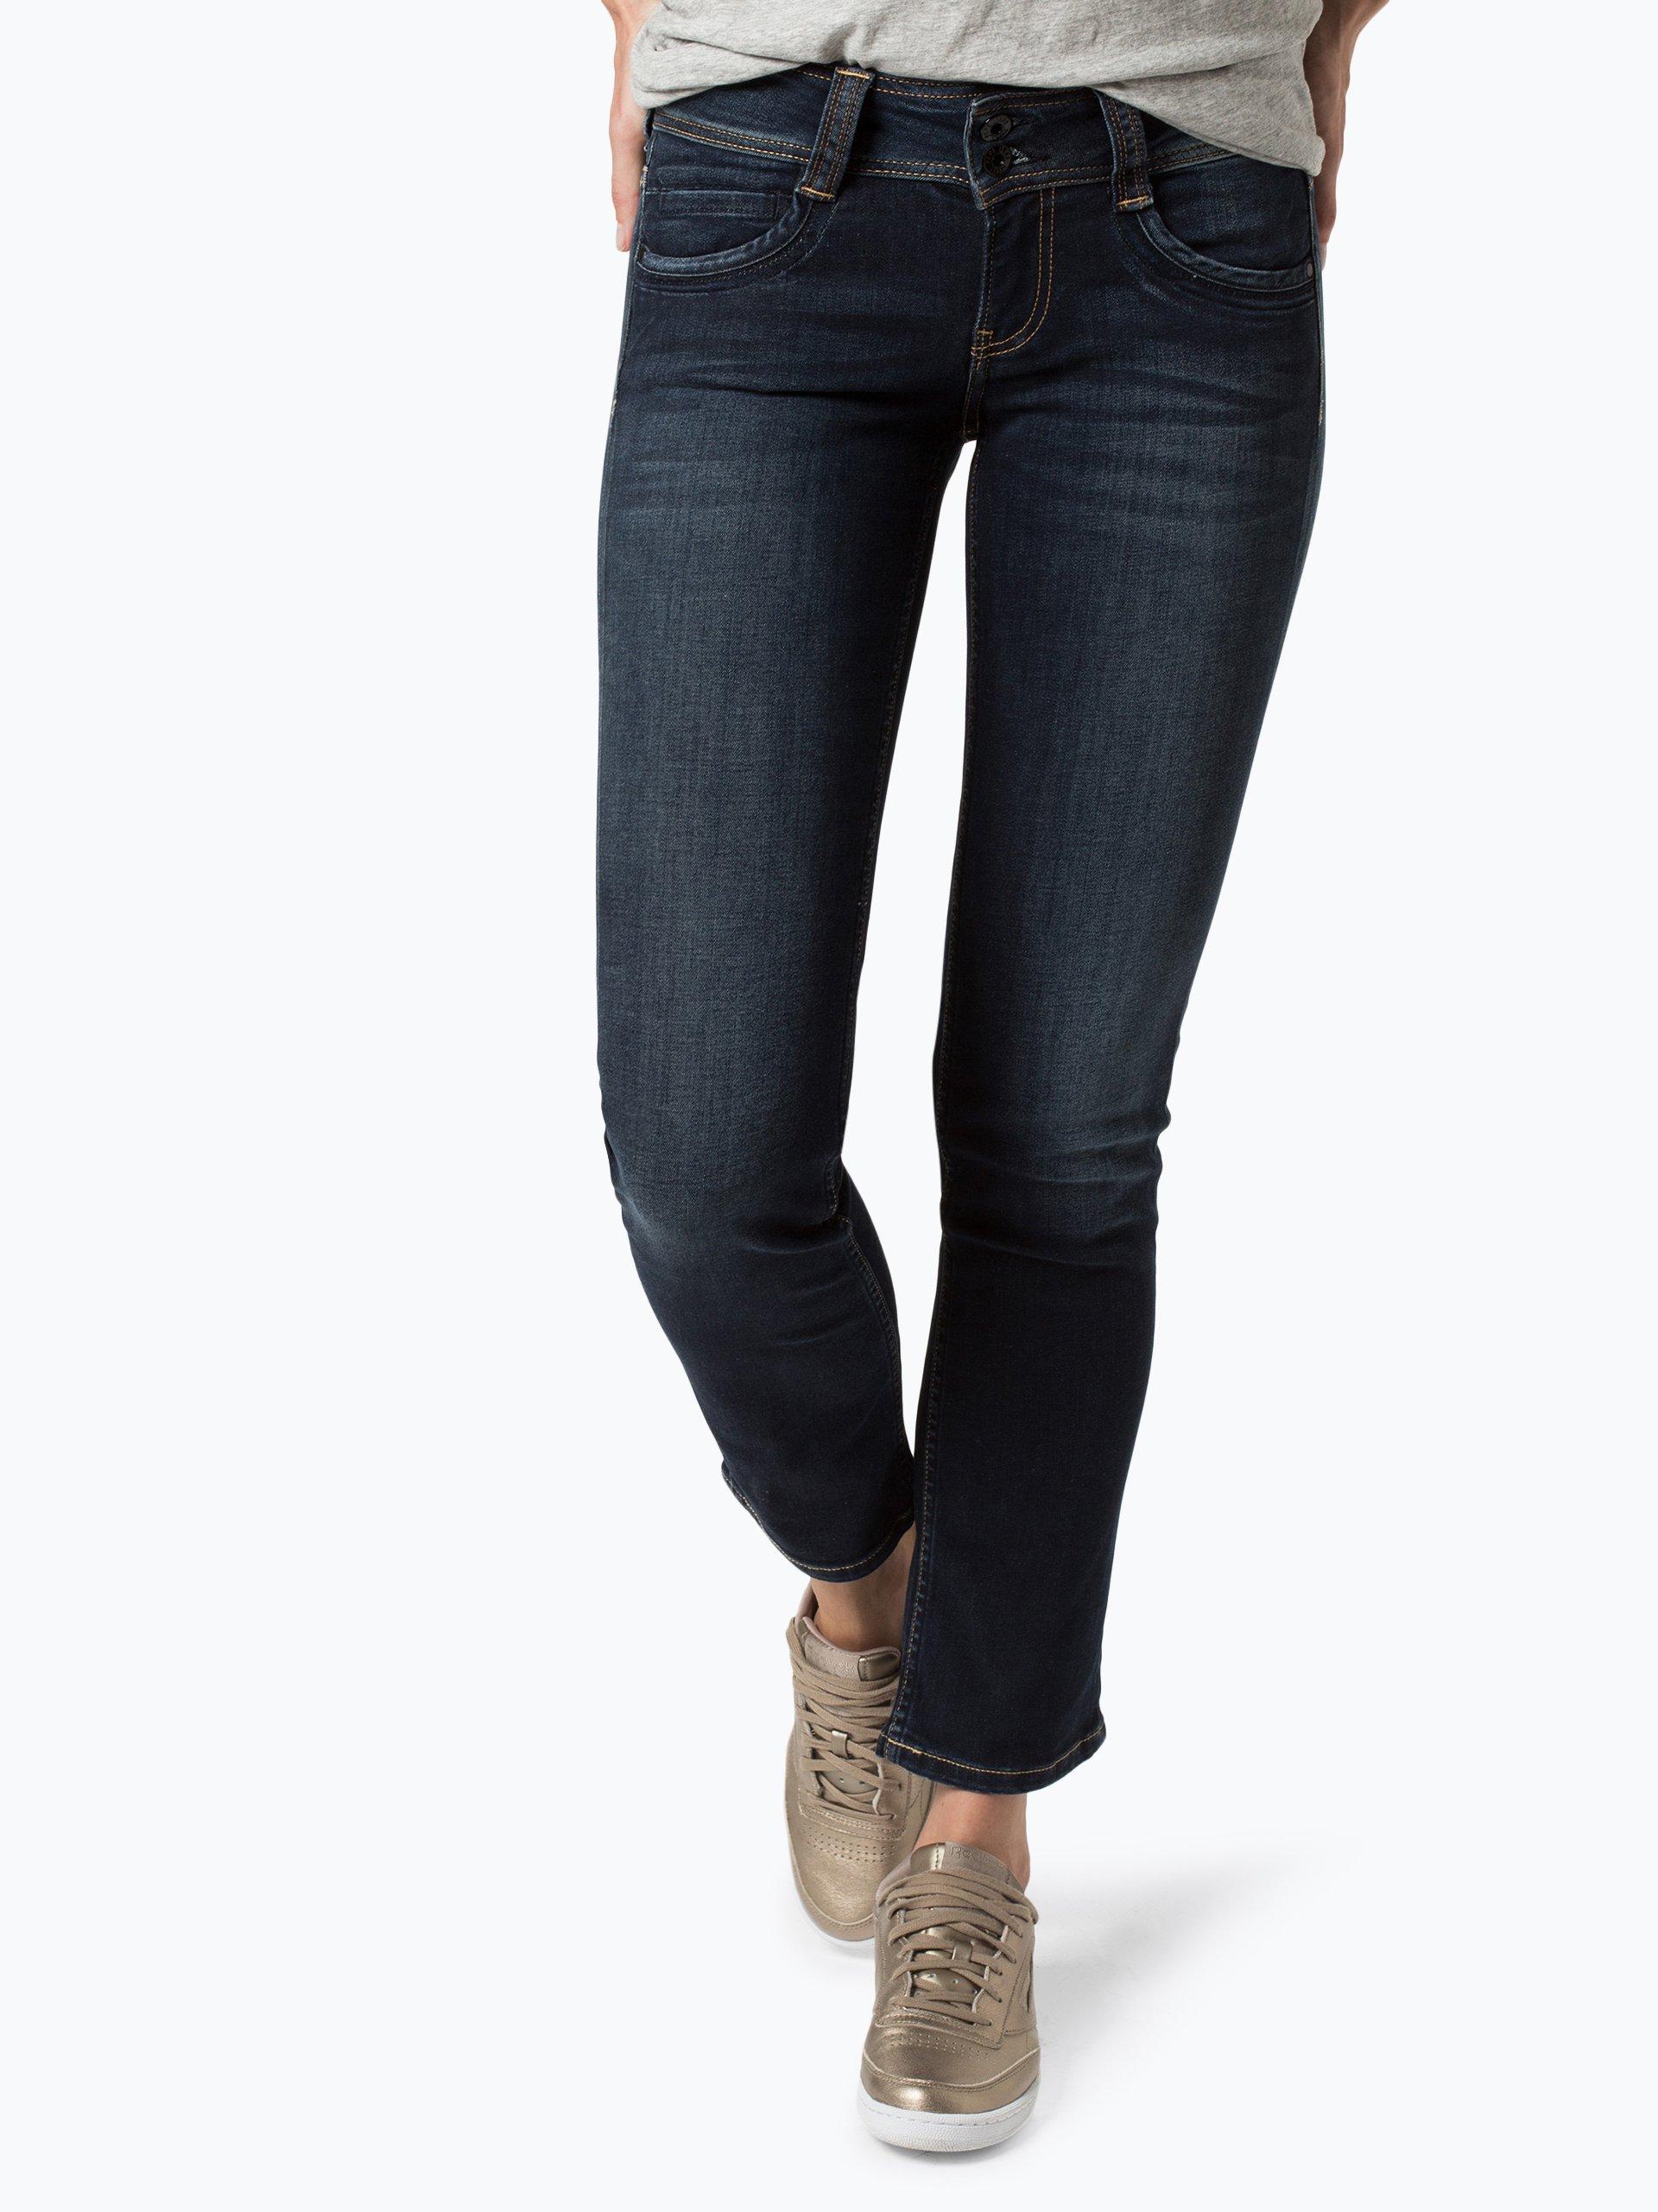 pepe jeans damen jeans gen marine uni online kaufen peek und cloppenburg de. Black Bedroom Furniture Sets. Home Design Ideas